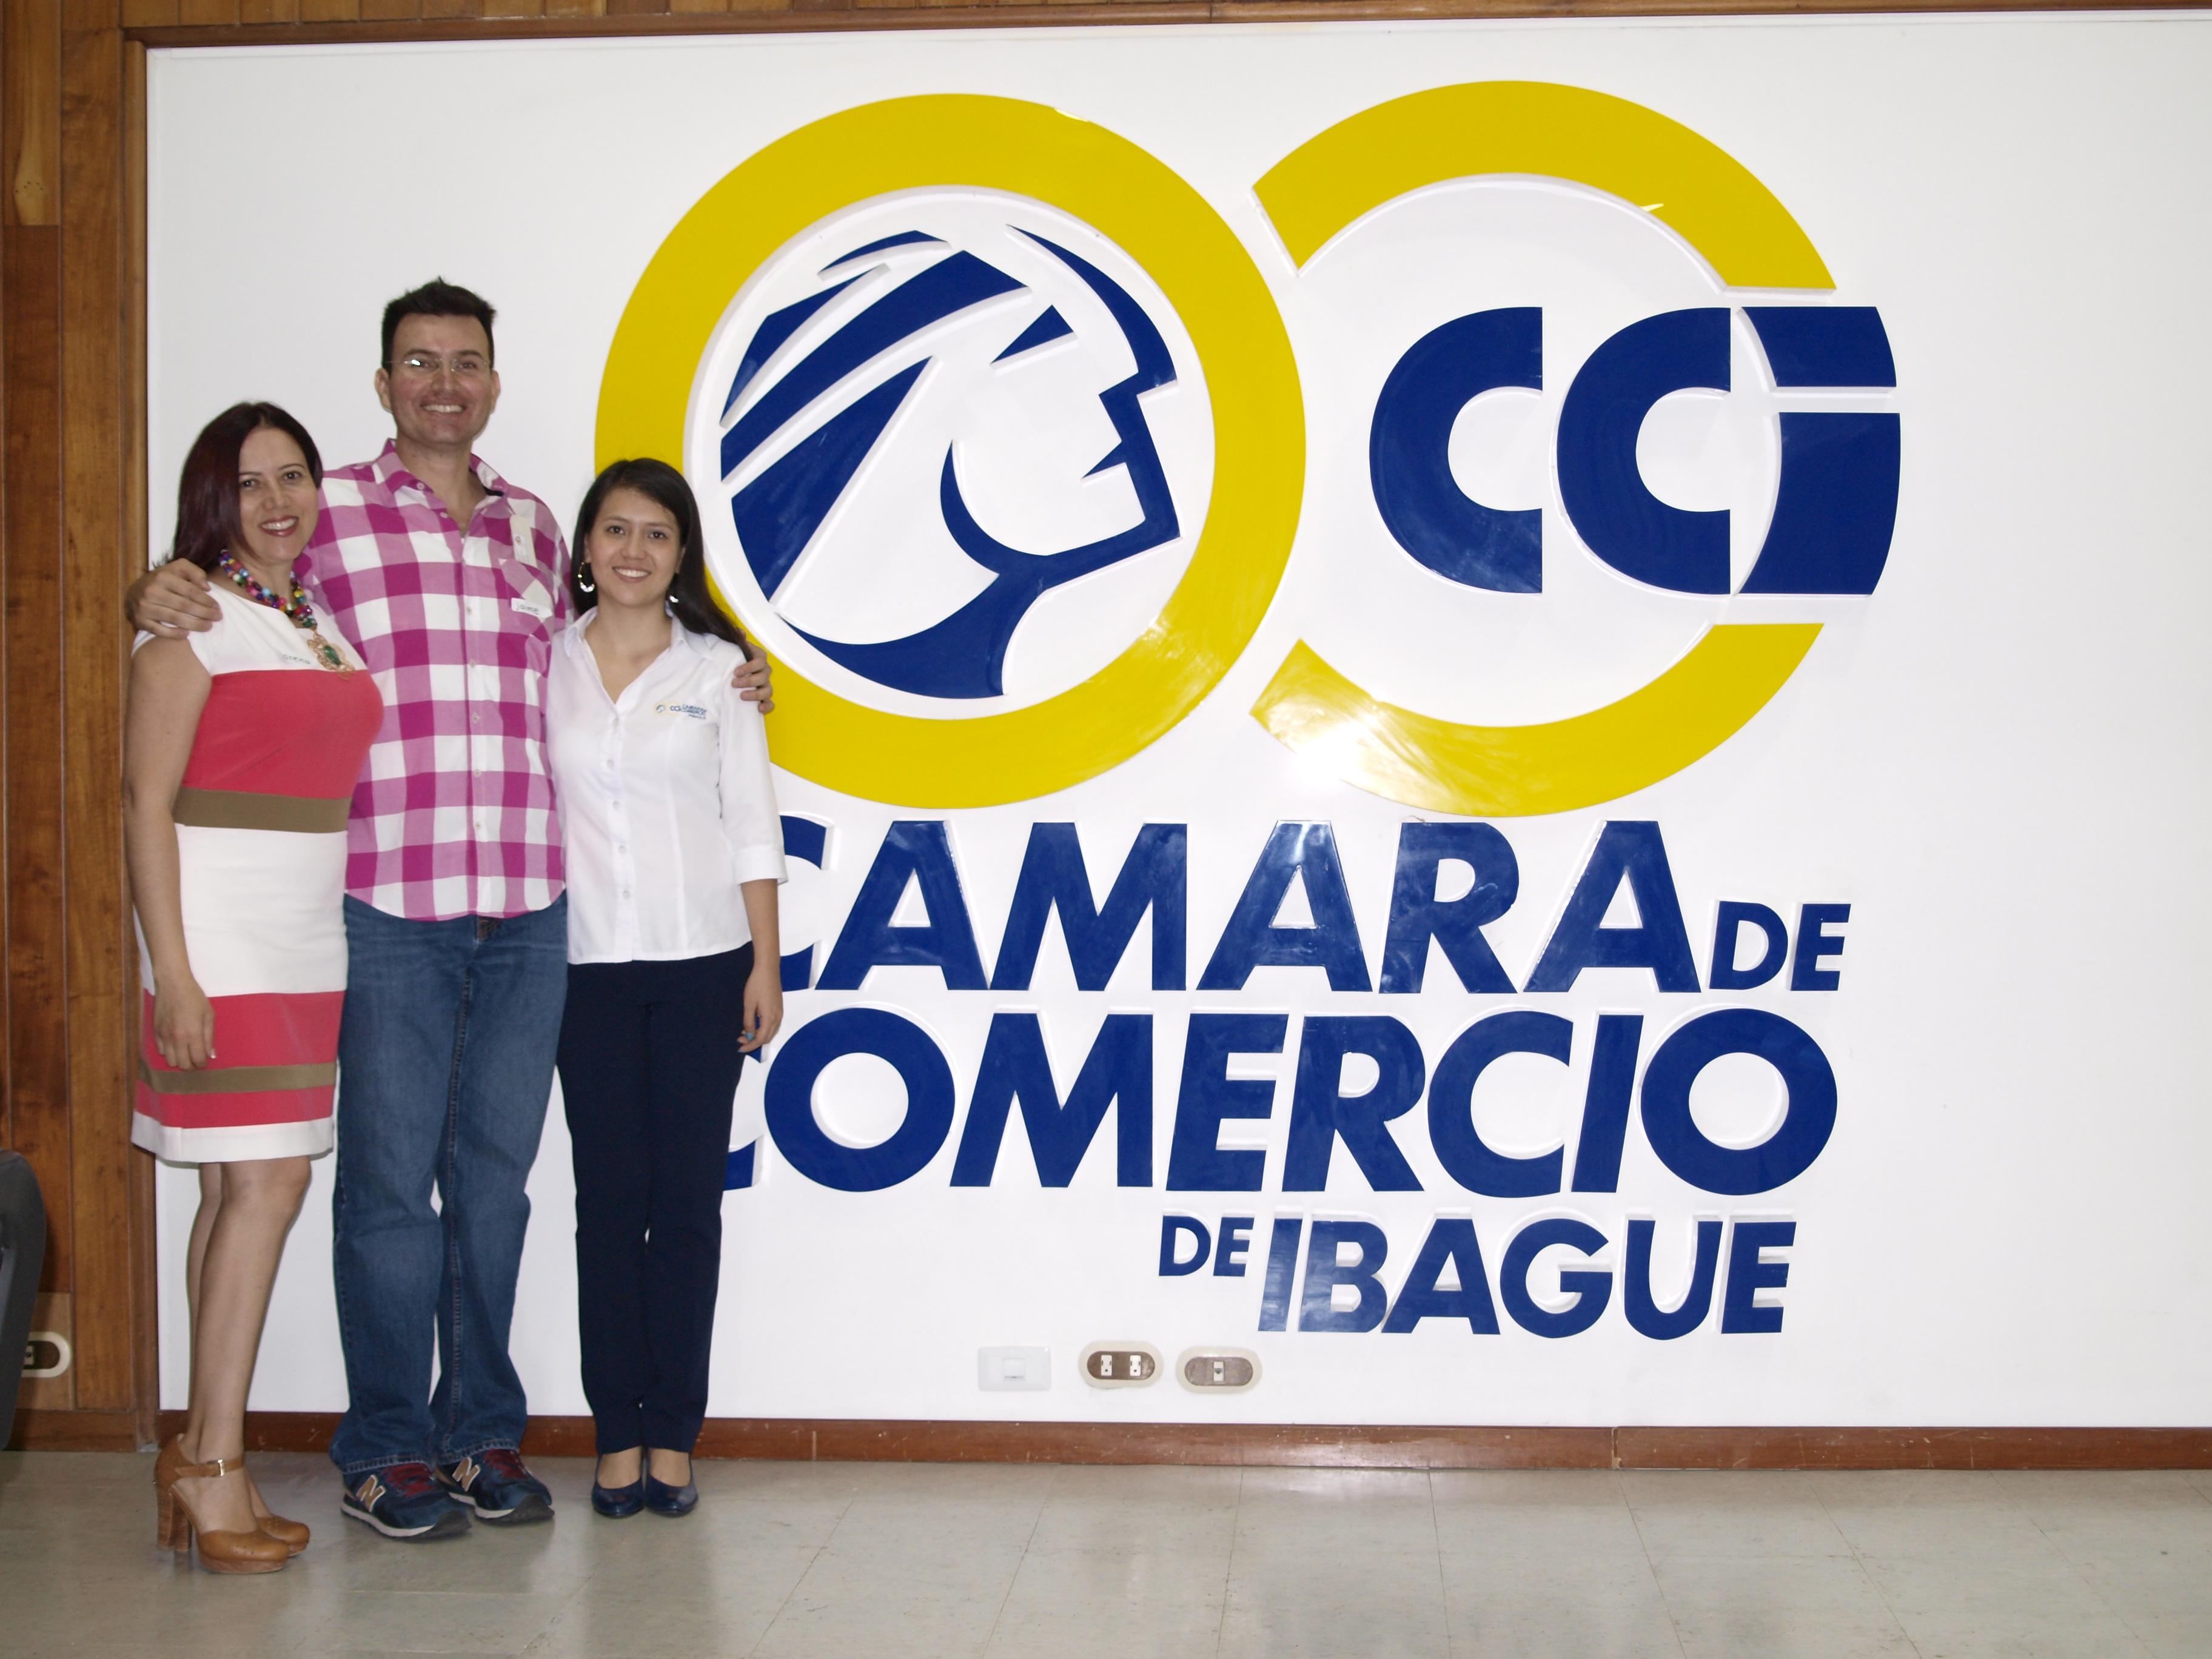 Lorena Jaime Laurita Camara de Comercio